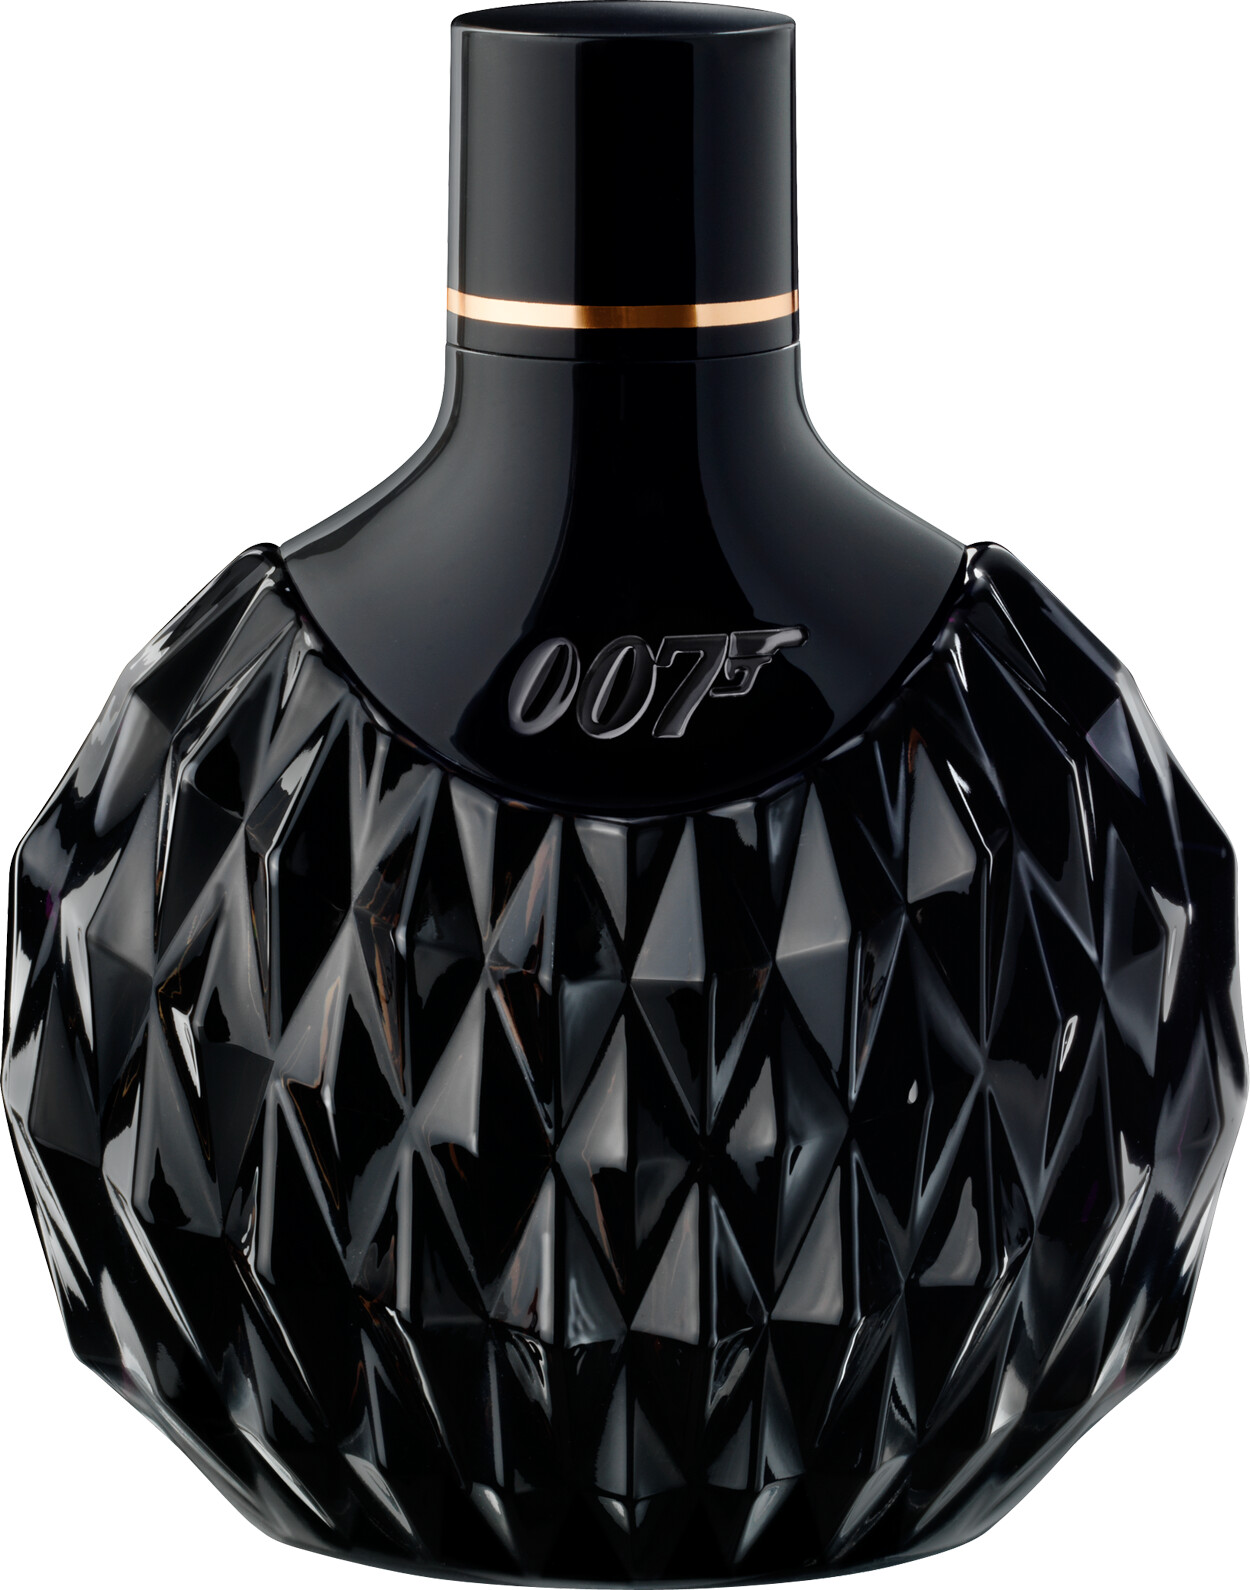 007 Fragrances For Women Eau de Parfum Spray 75ml